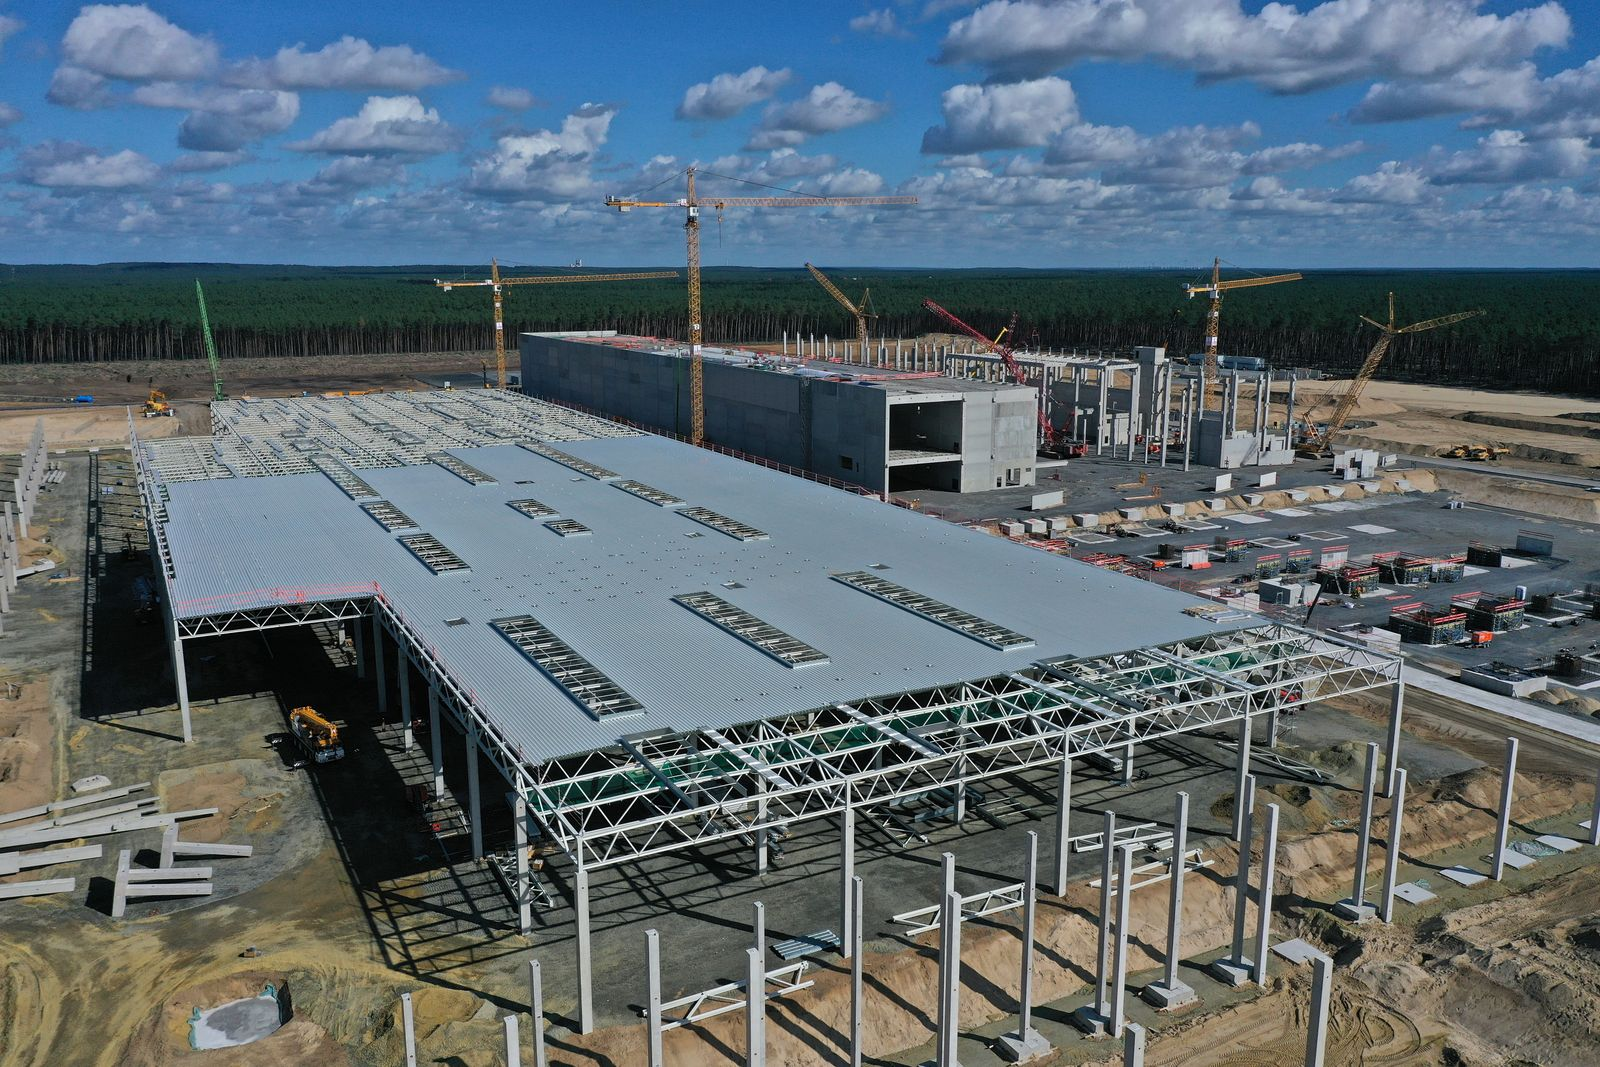 *** BESTPIX *** Aerial Views Of New Tesla Gigafactory Construction Site